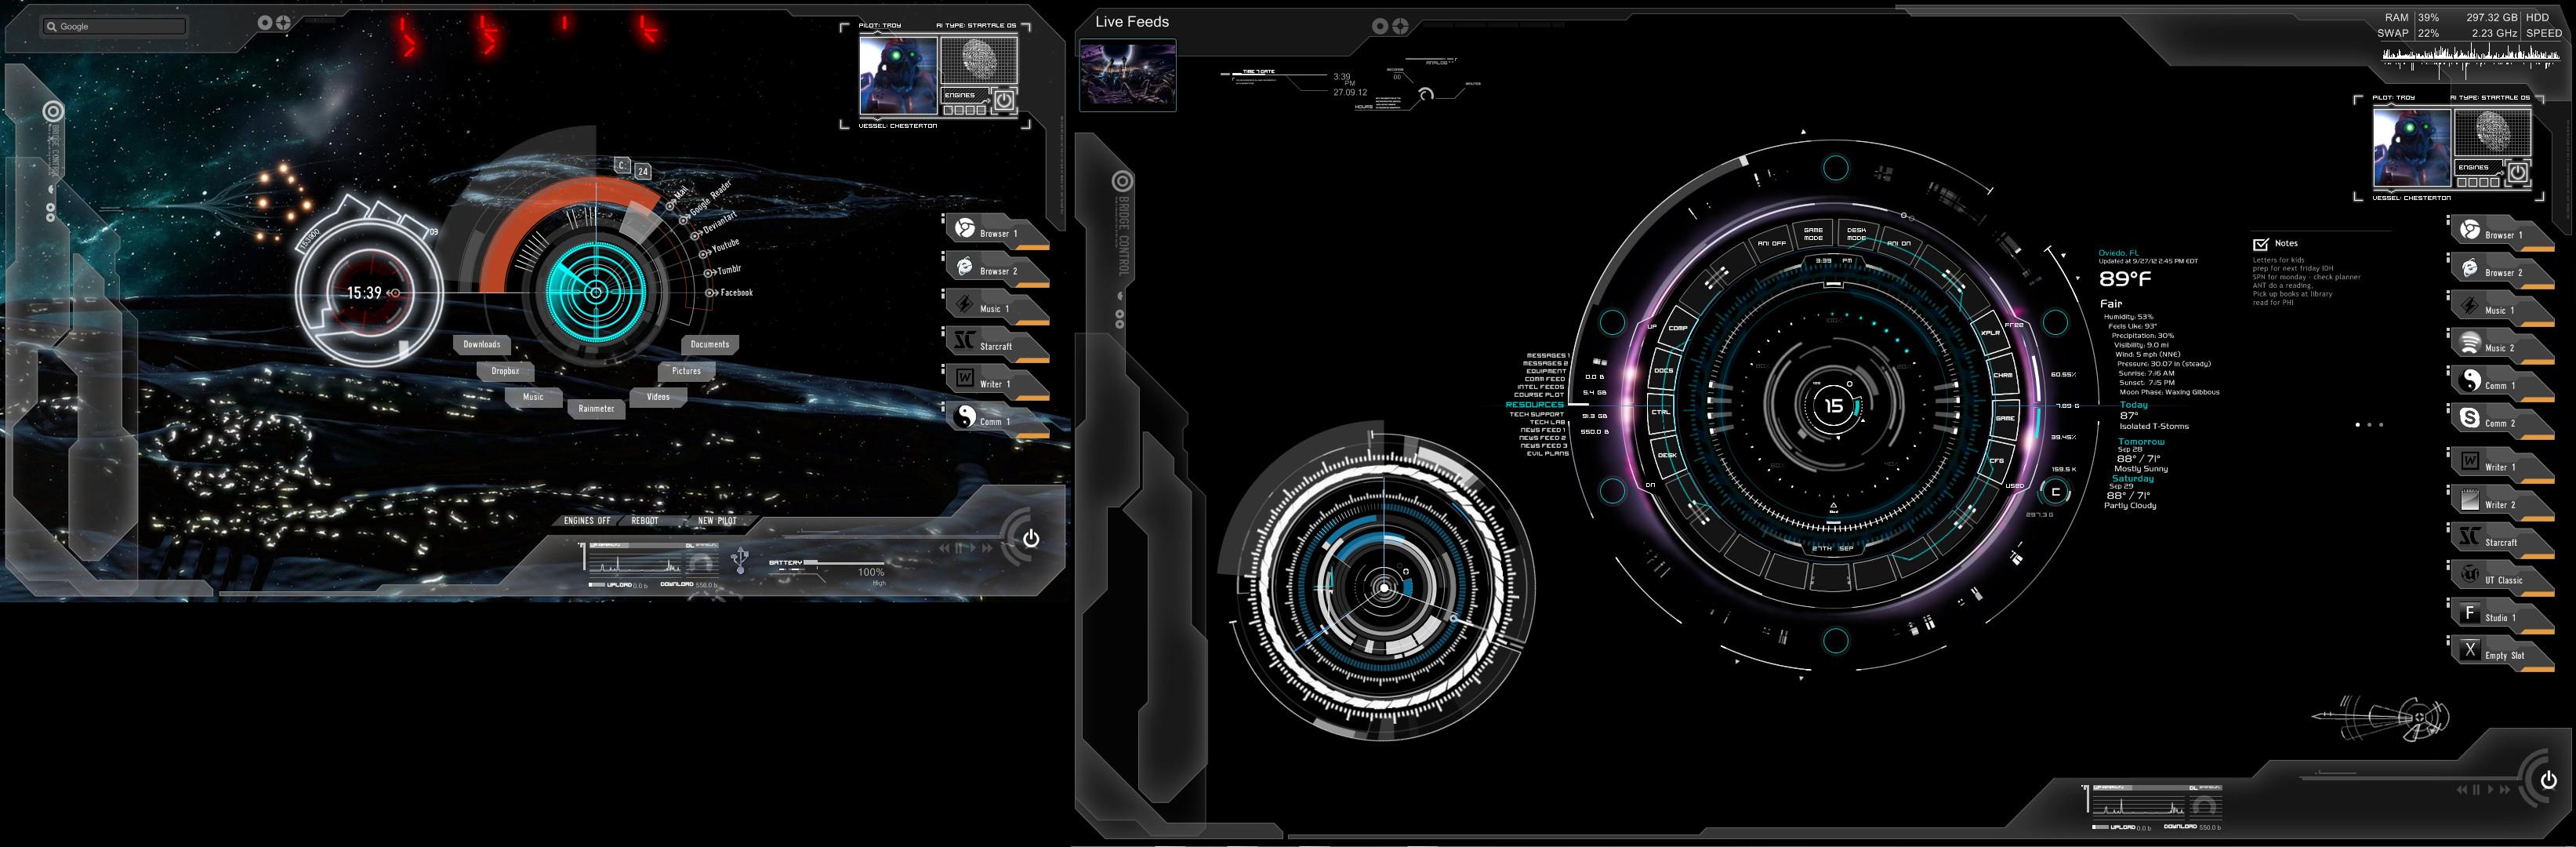 Prometheus Windows 7 Theme-Rainmeter rated popular by mannem on .